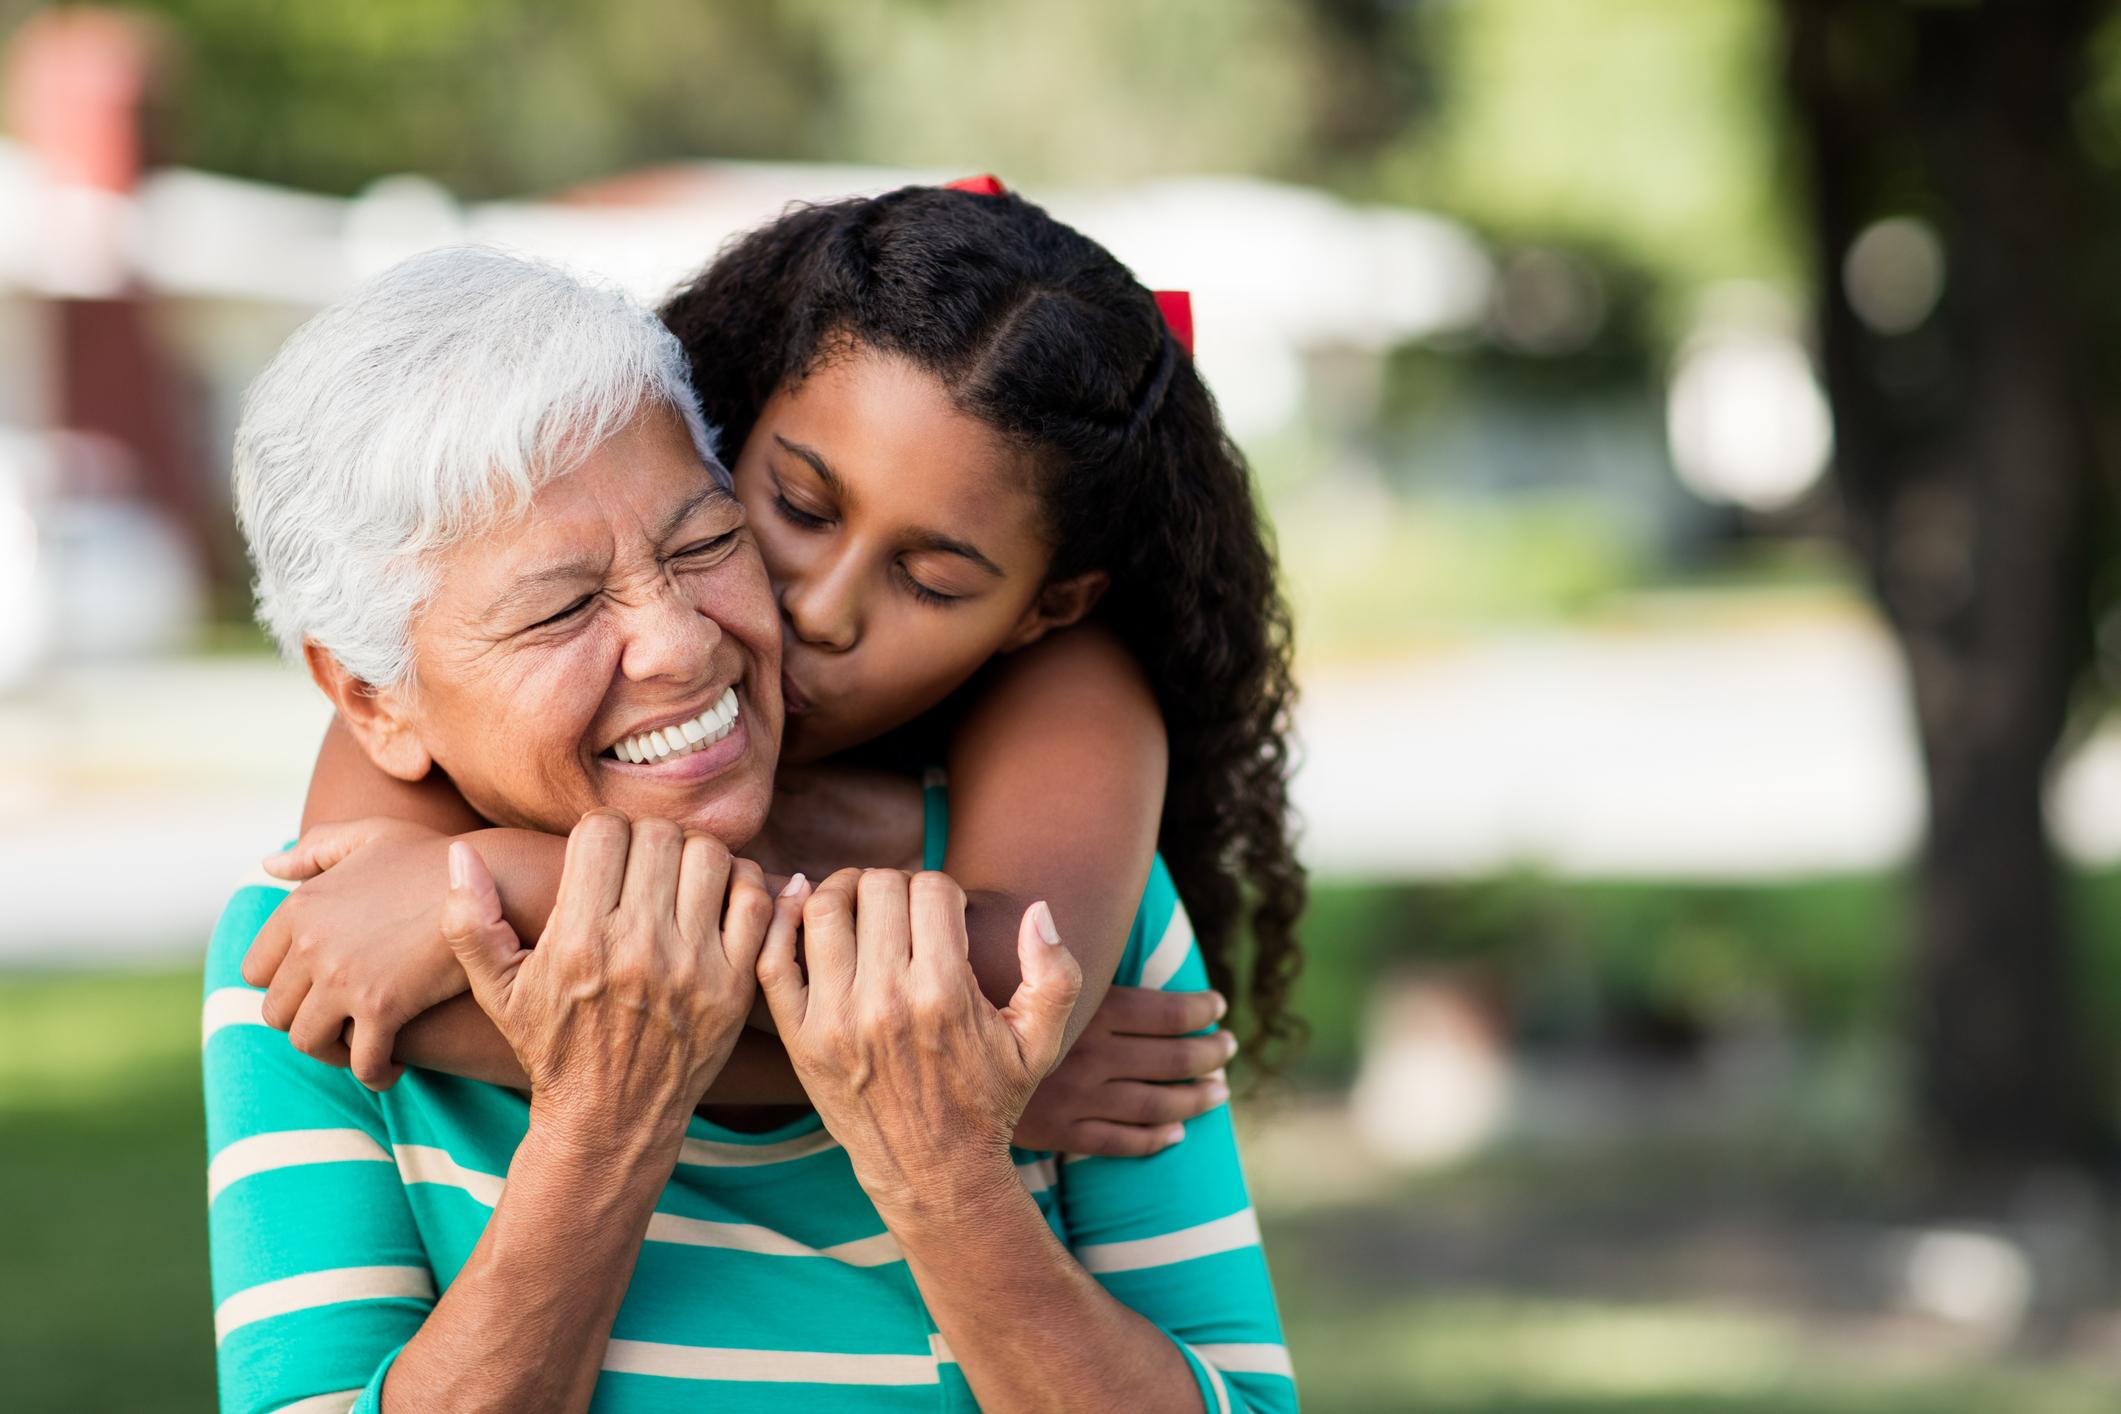 Loving Teen Girl Embracing And Kissing Grandmother